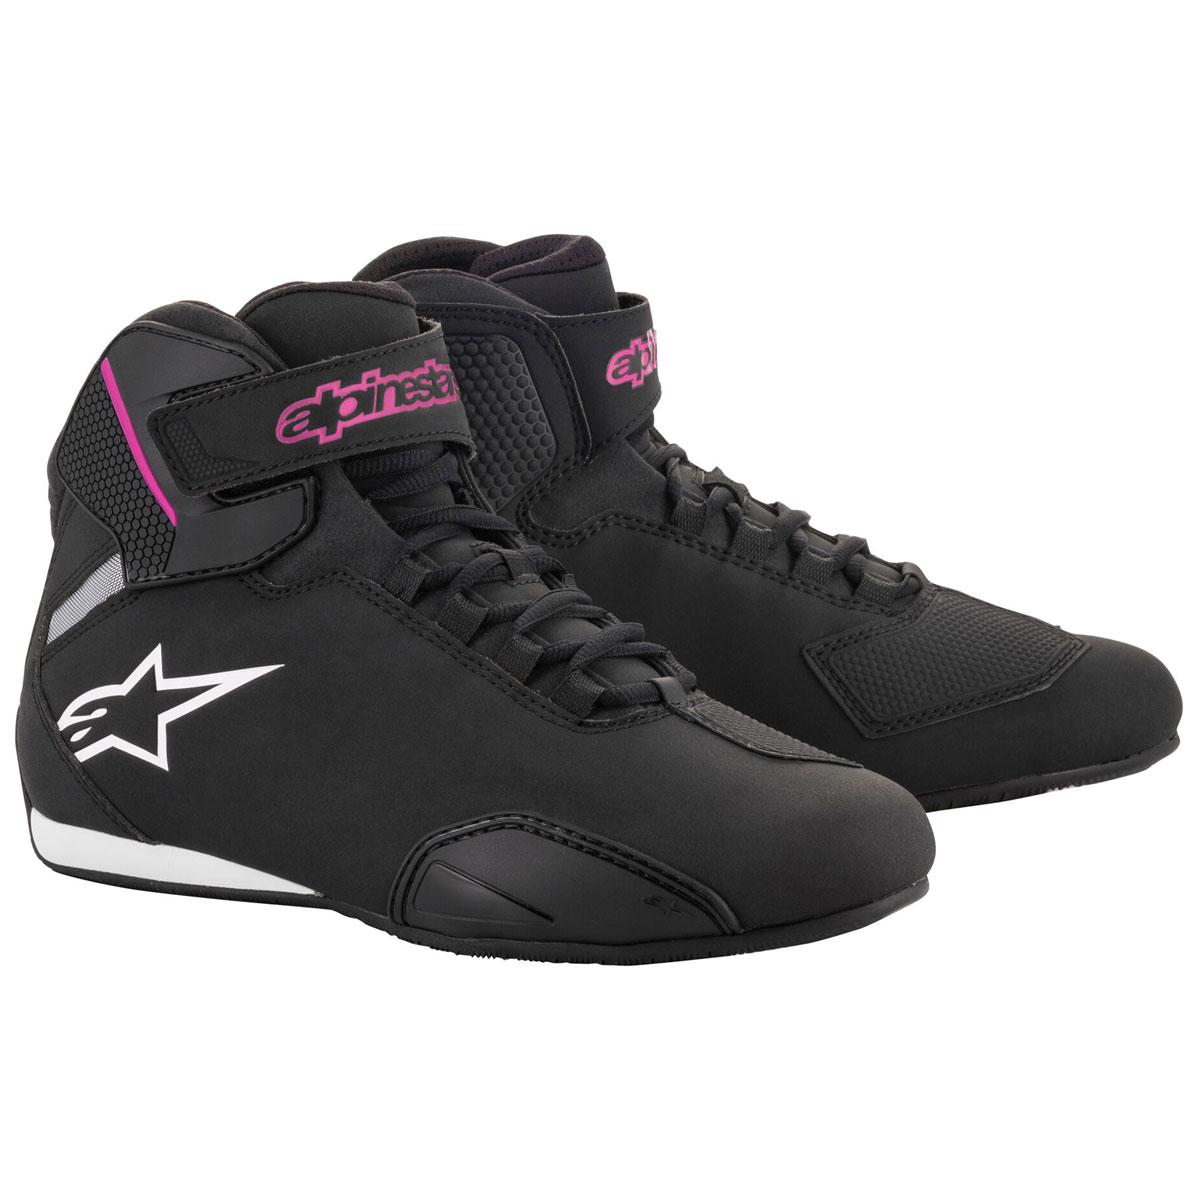 Alpinestars Women's Stella Secktor Black/Pink Riding Shoes